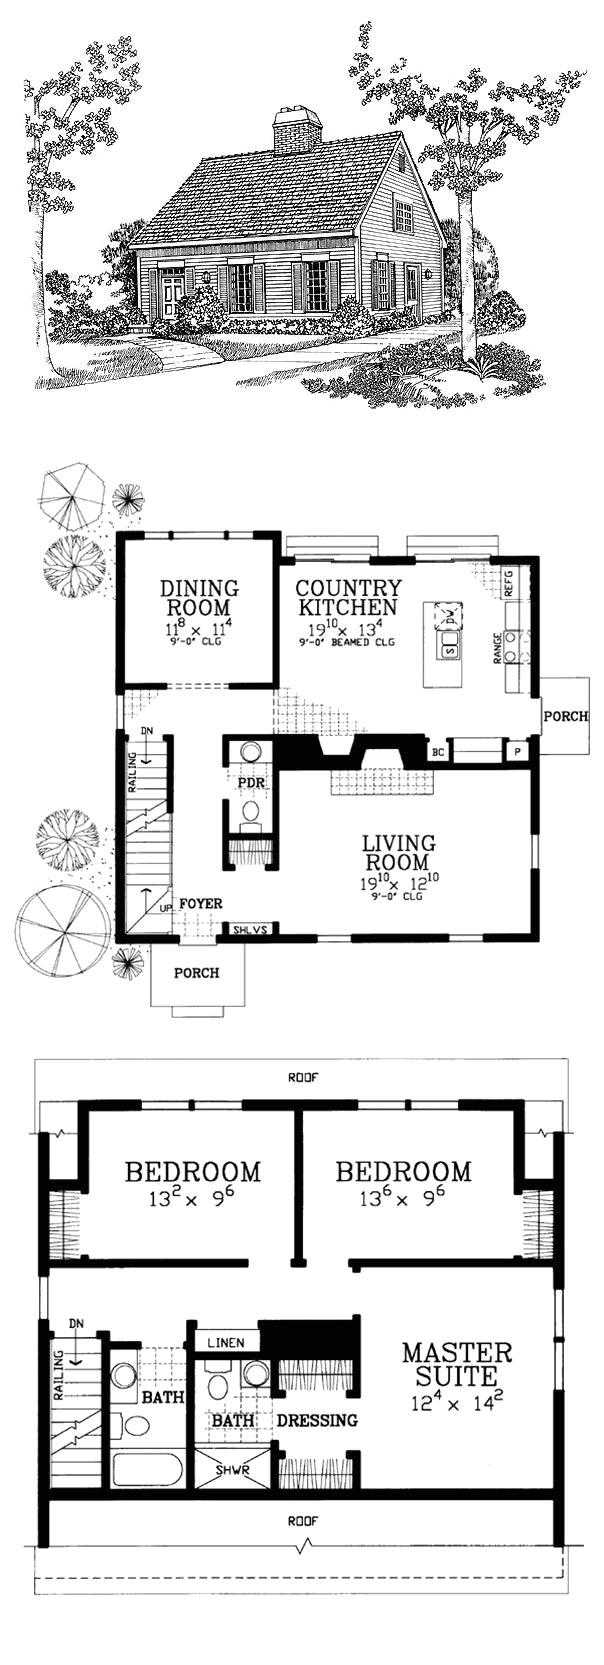 8x5 bathroom floor plans best of 3 bedroom 3 bath house plans house floor plans 3